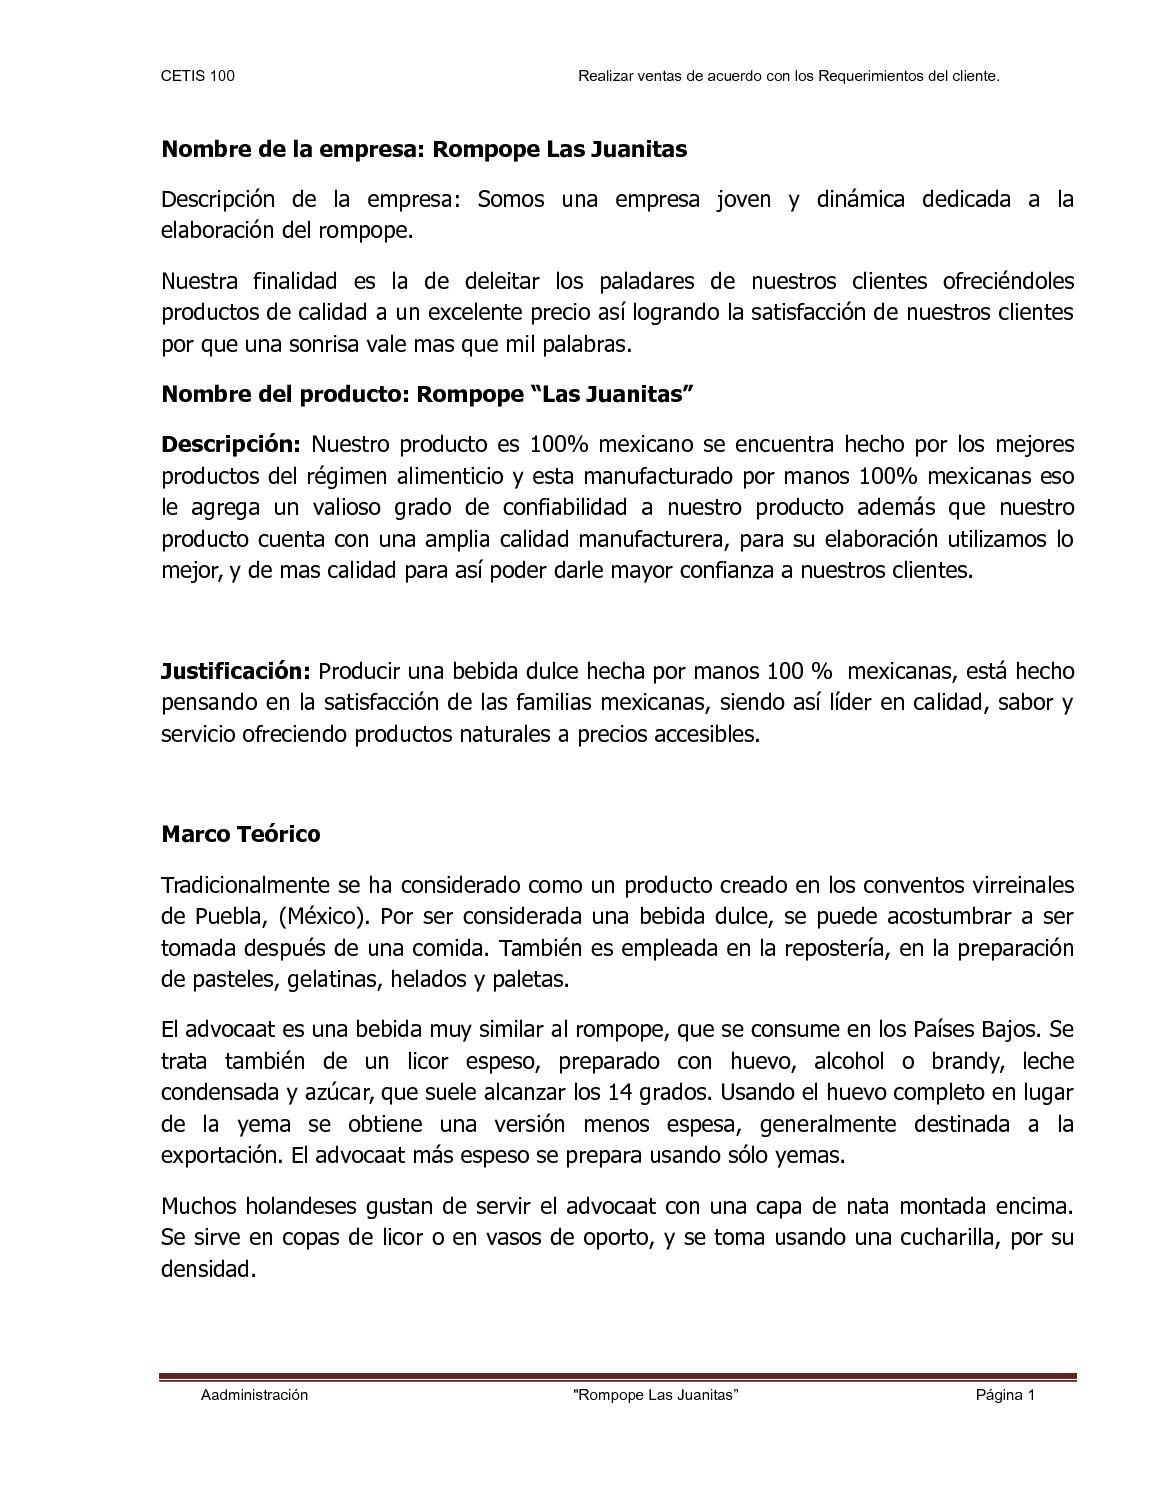 Calaméo - Rompope las Juantas